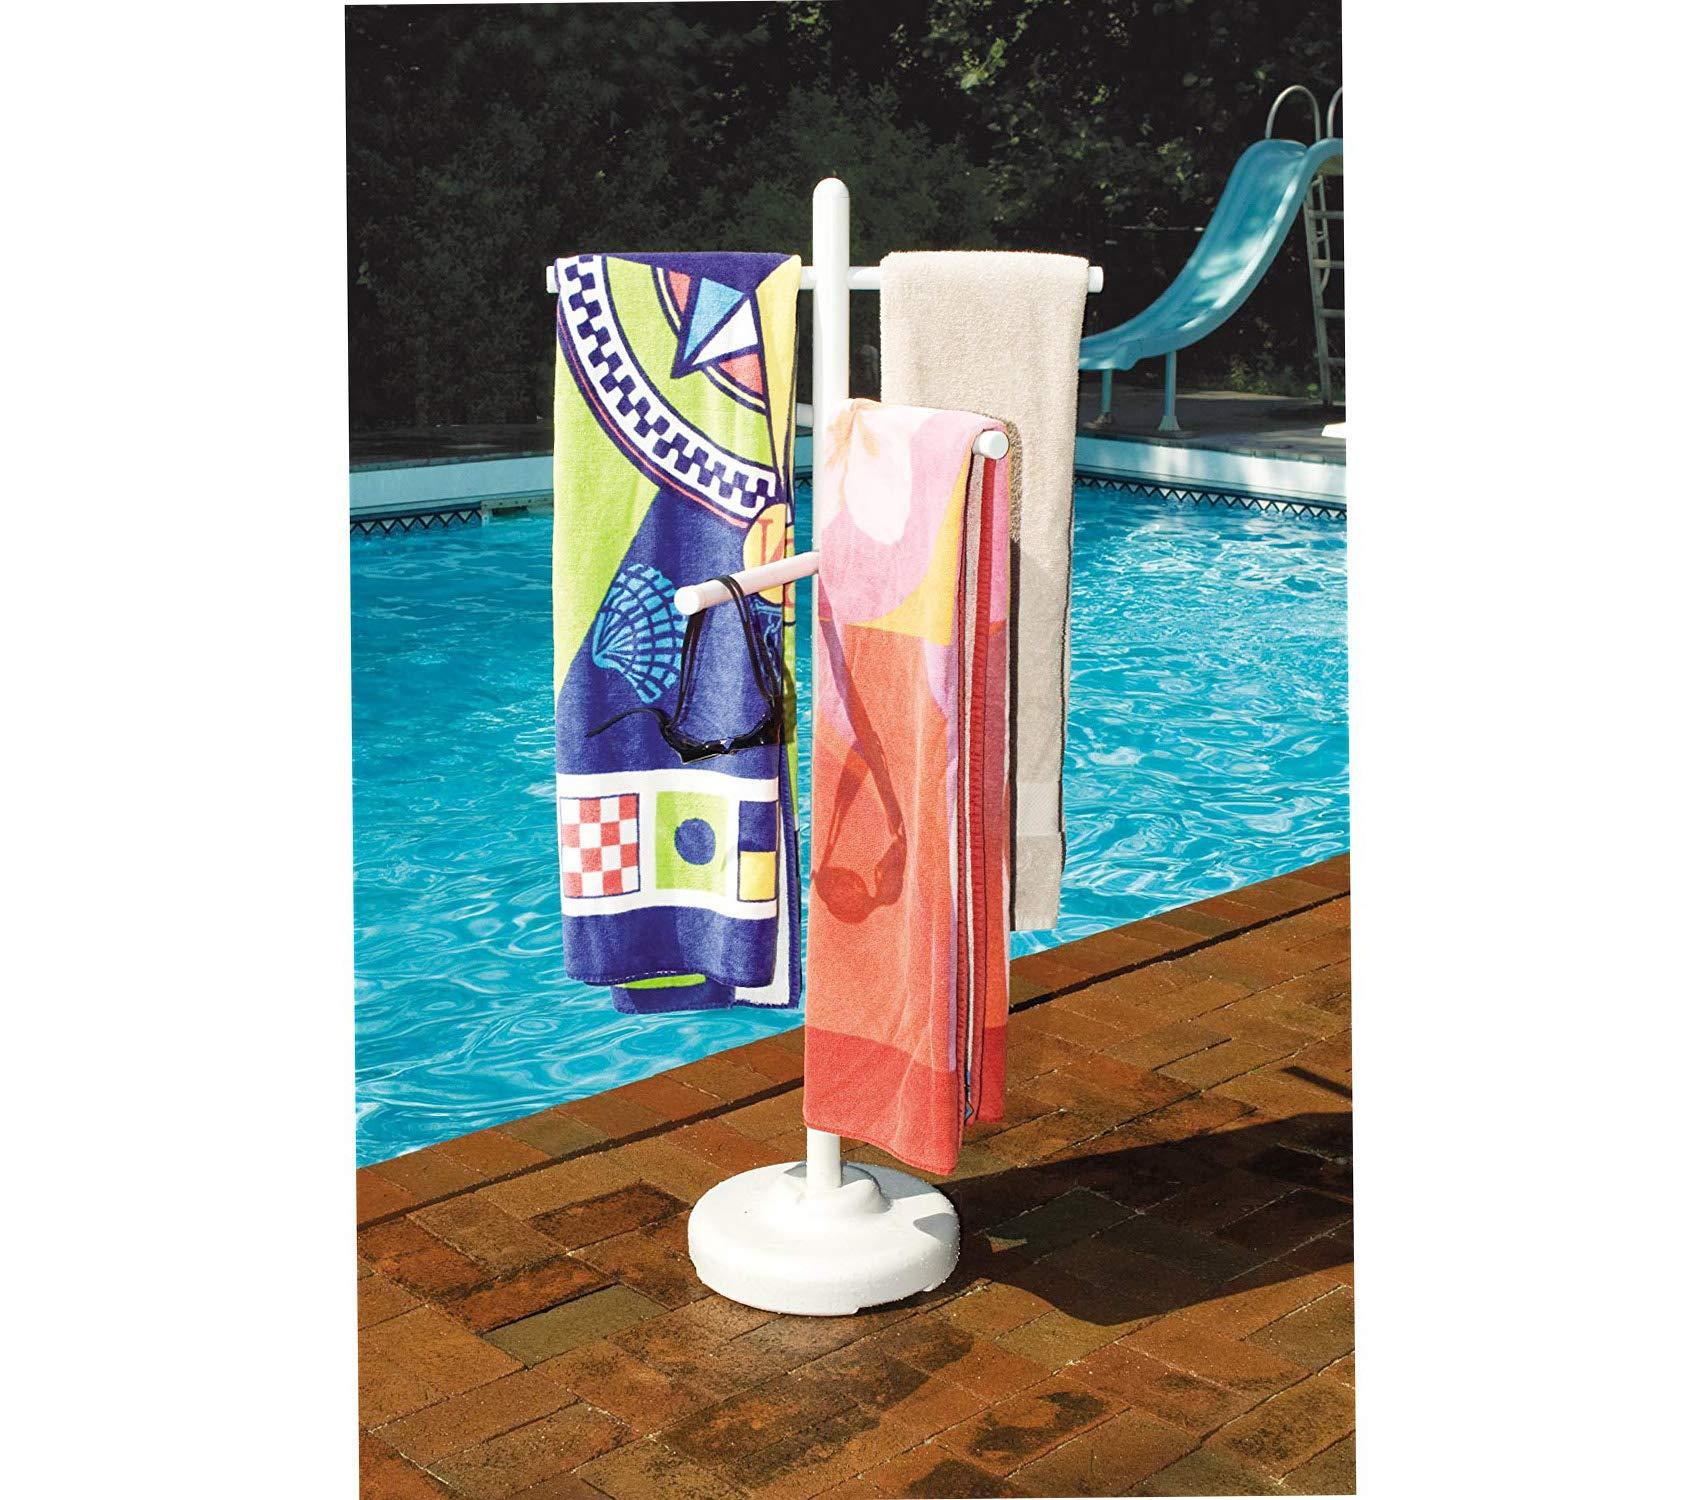 Home Décor Premium HydroTools by Poolside Towel Rack Storage